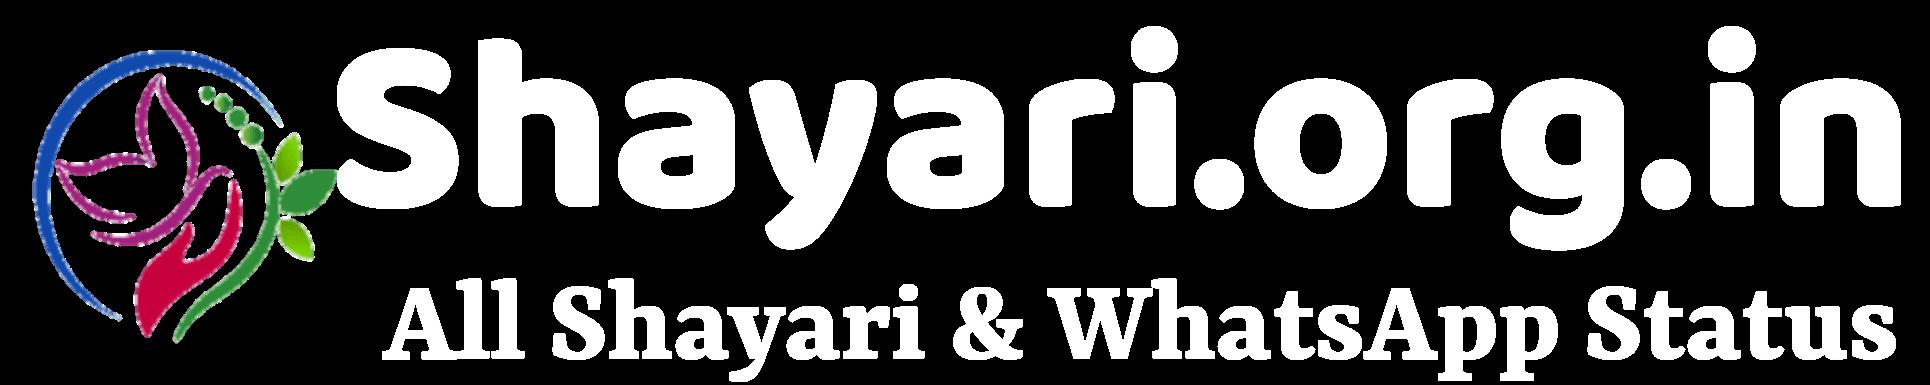 welcom to Shayari No. 1 Website shayari.org.in | हिंदी शायरी, ગુજરાતી શાયરી